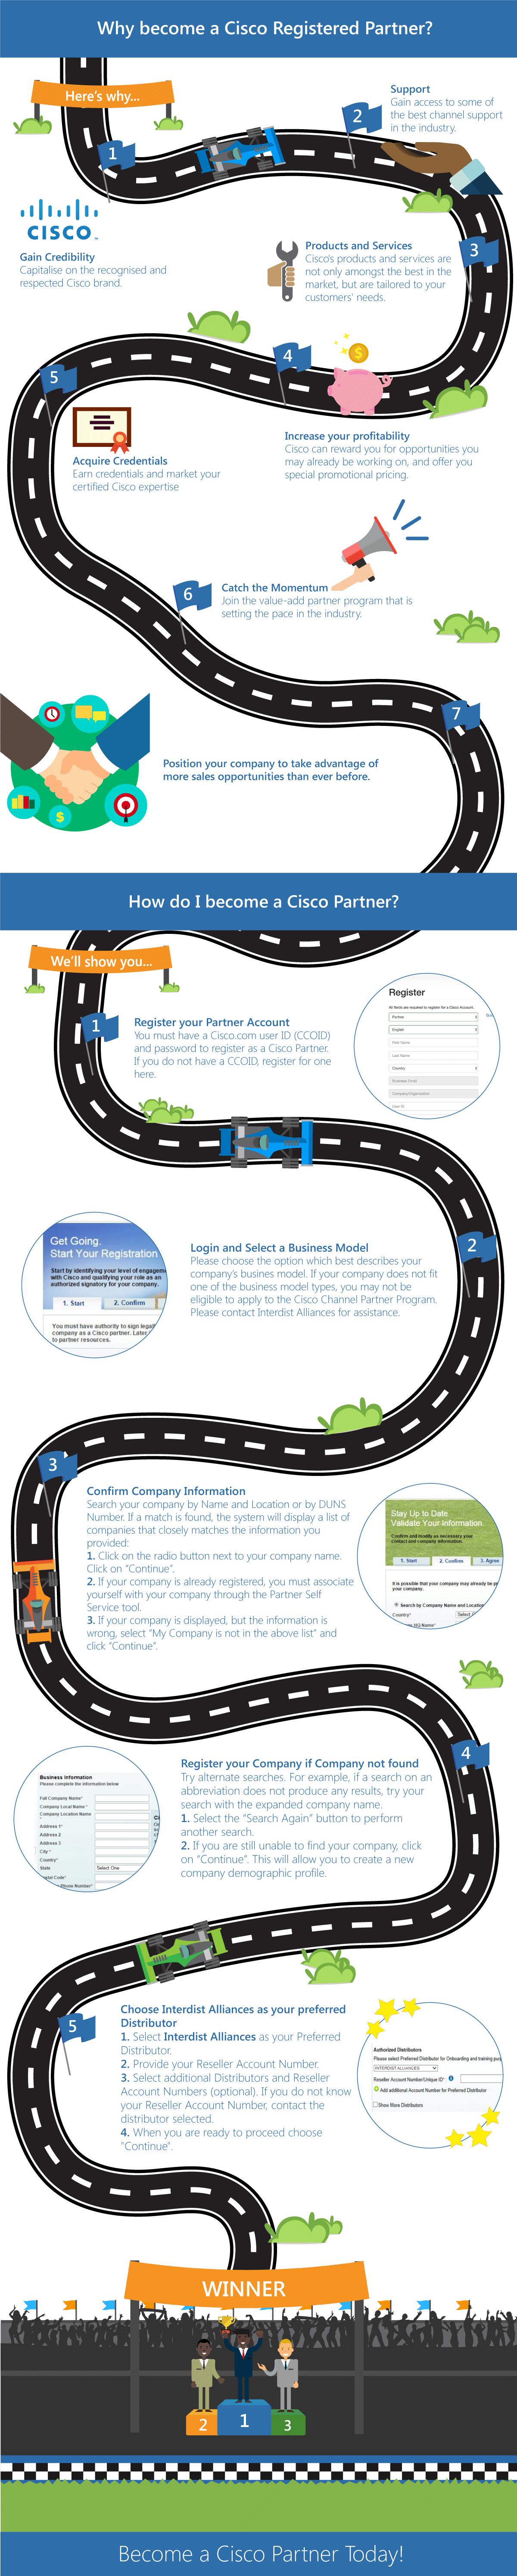 Become_a_Cisco_Partner_Infographic.jpg